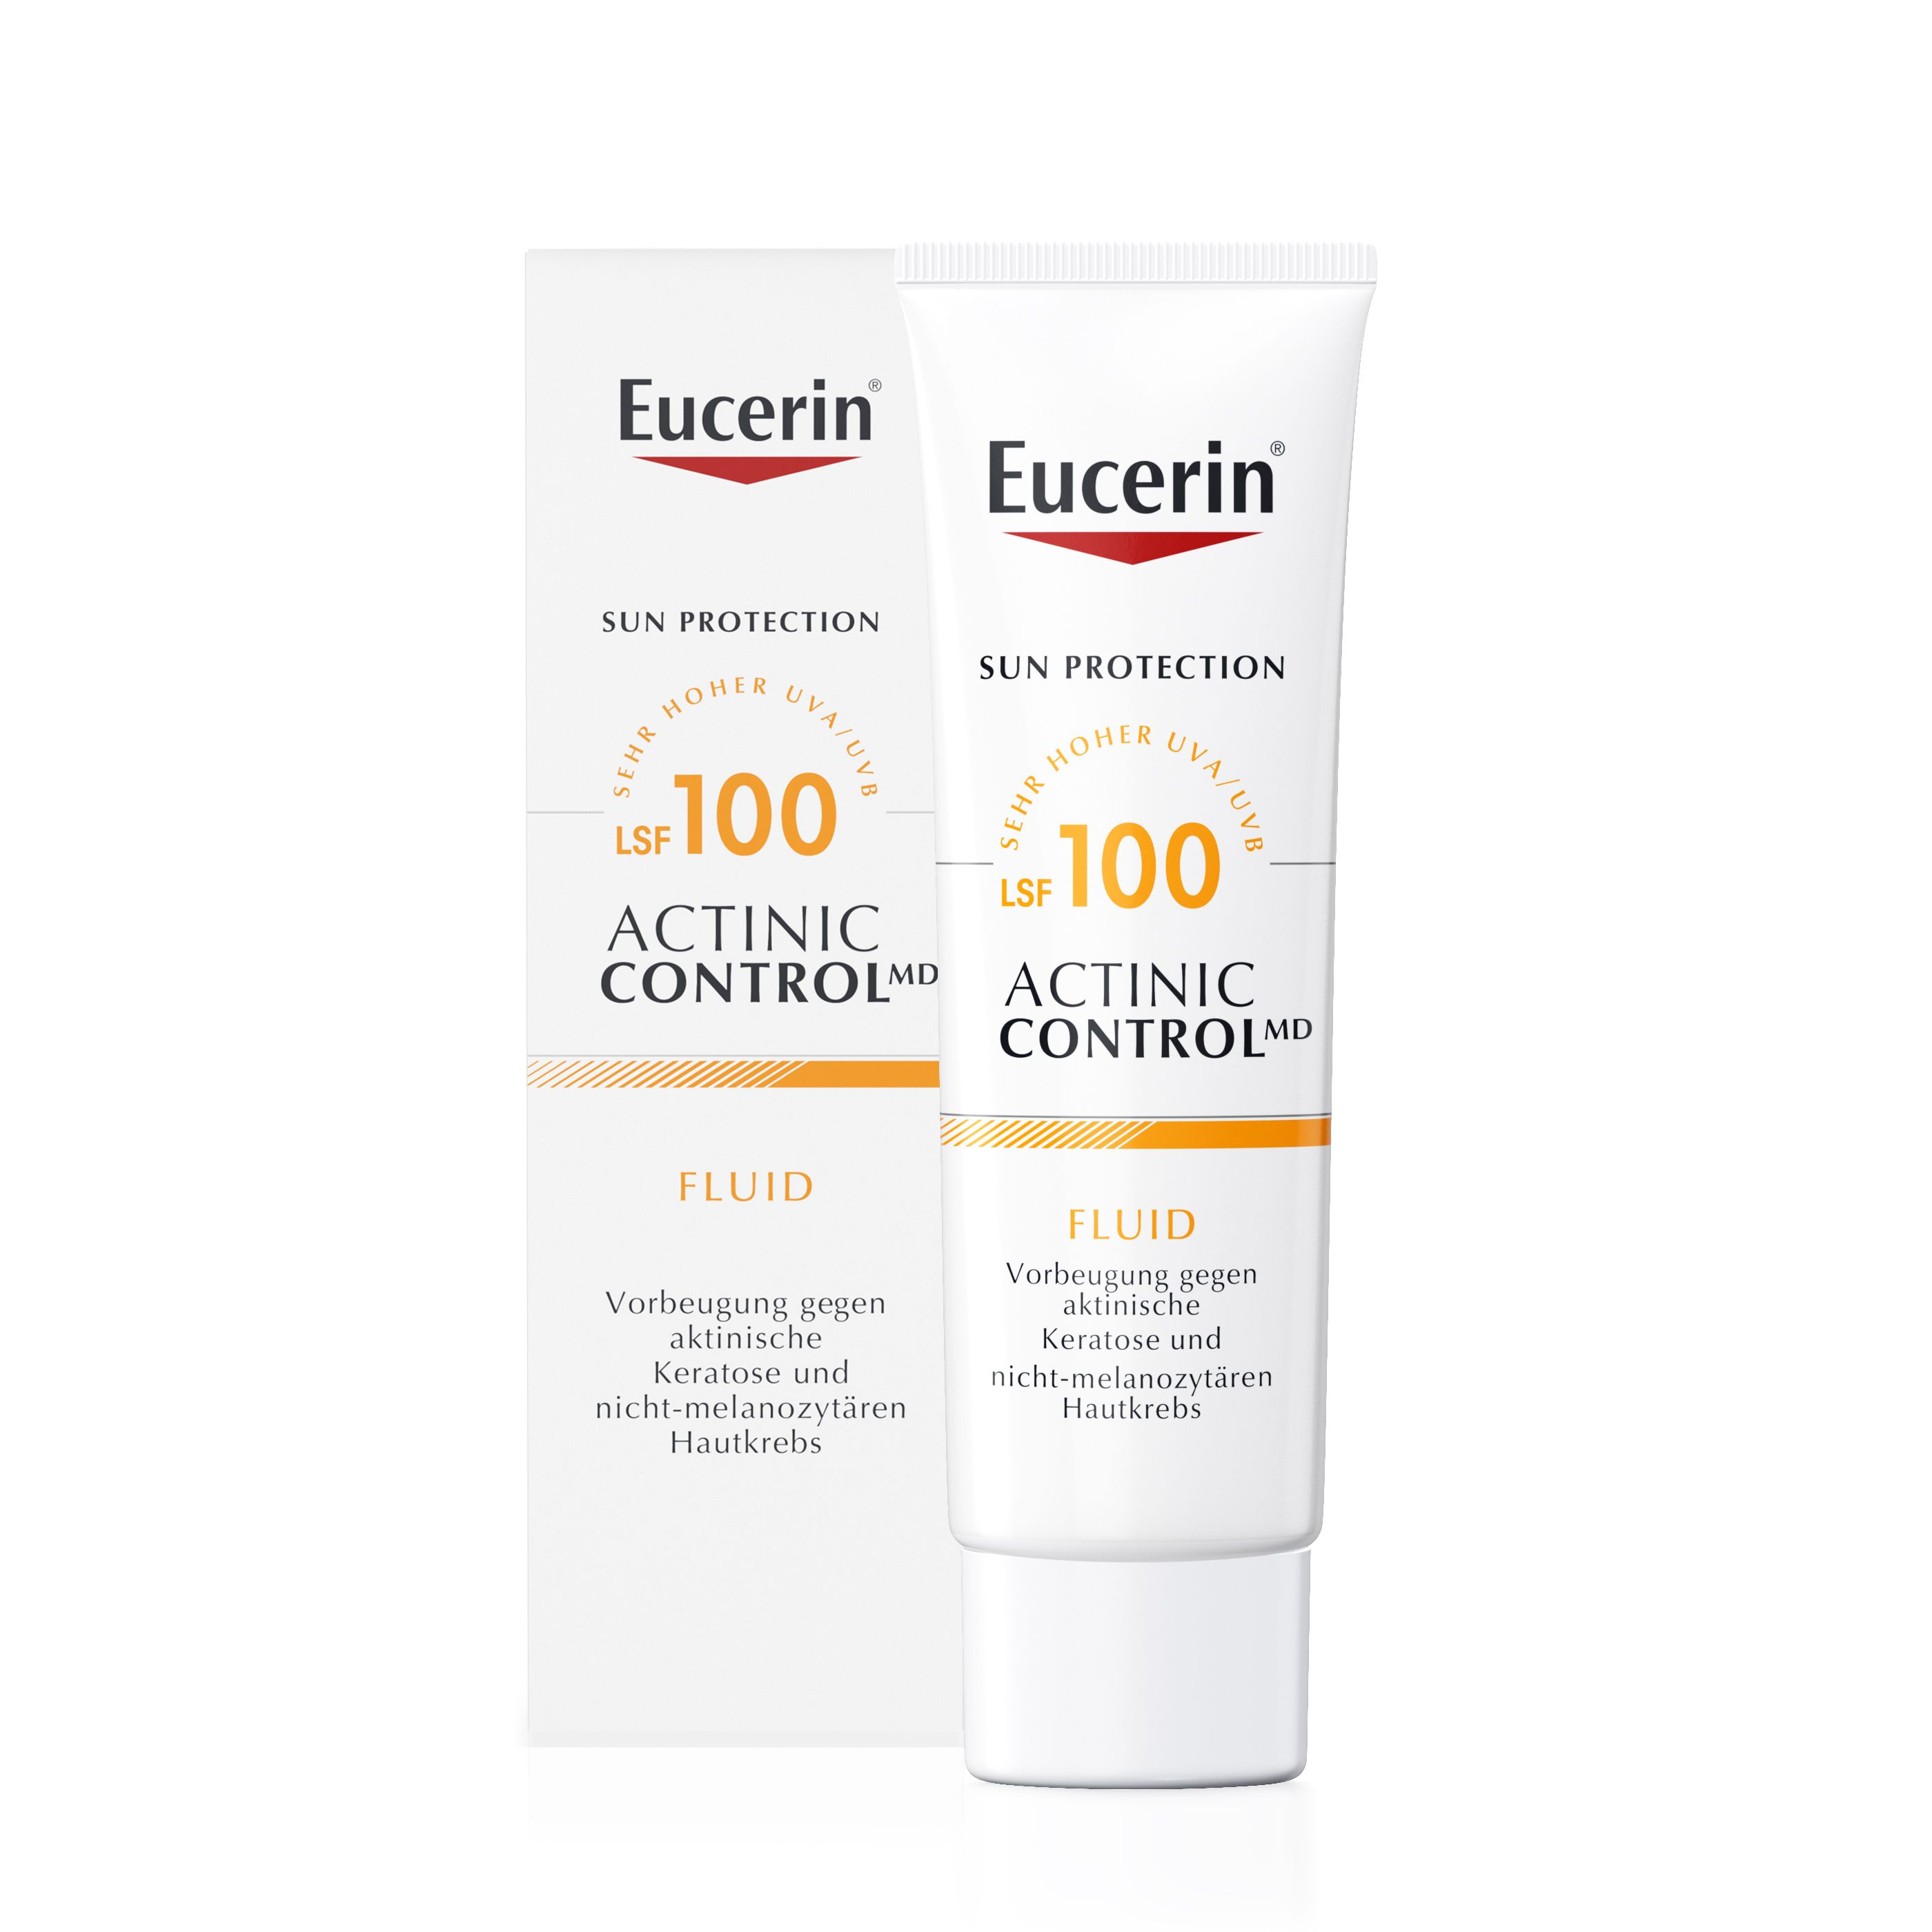 Image of Eucerin® Actinic ControlMD Sun LSF 100